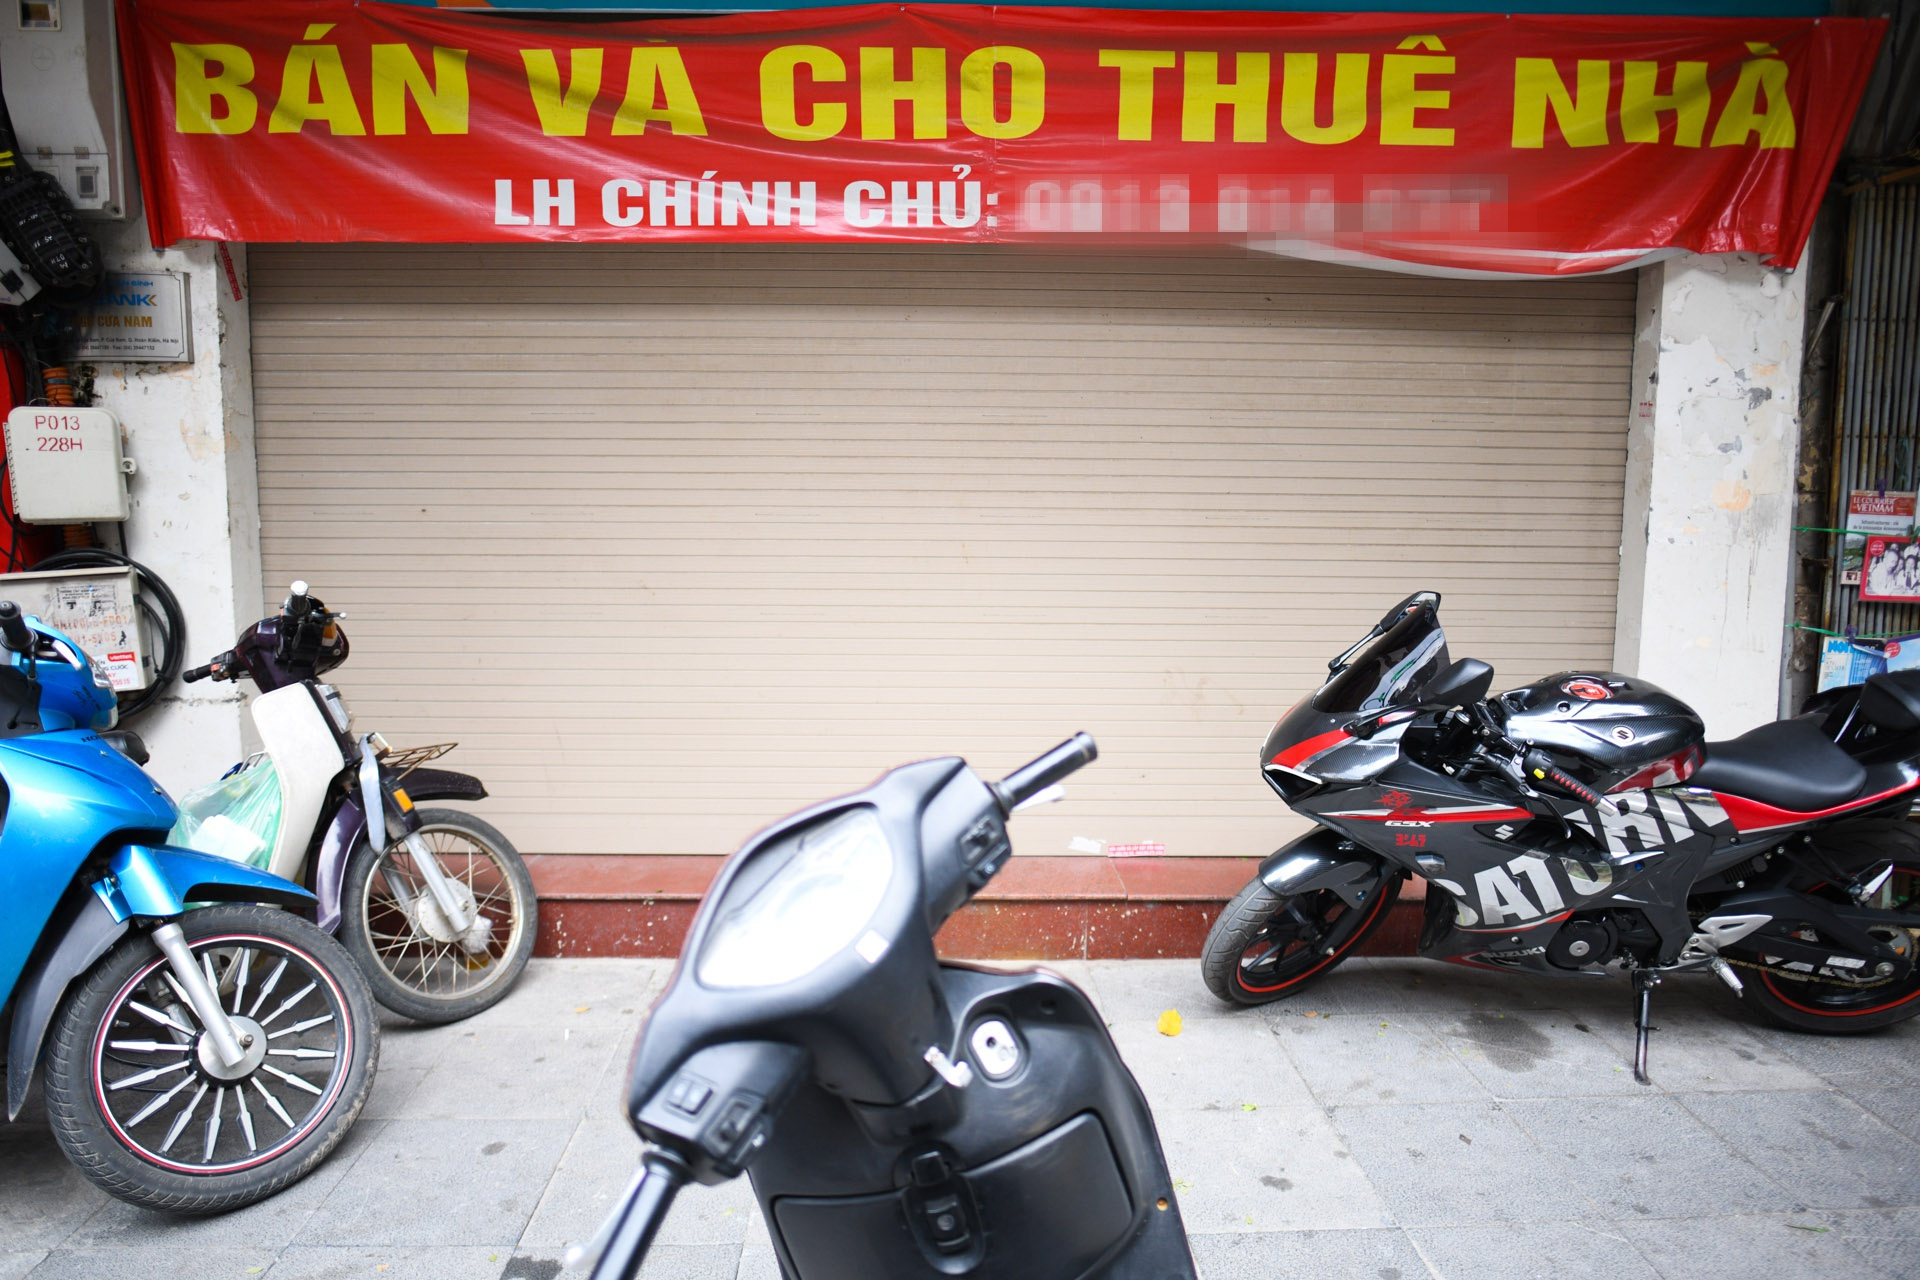 Cho thue nha Ha Noi, mat bang pho co anh 5